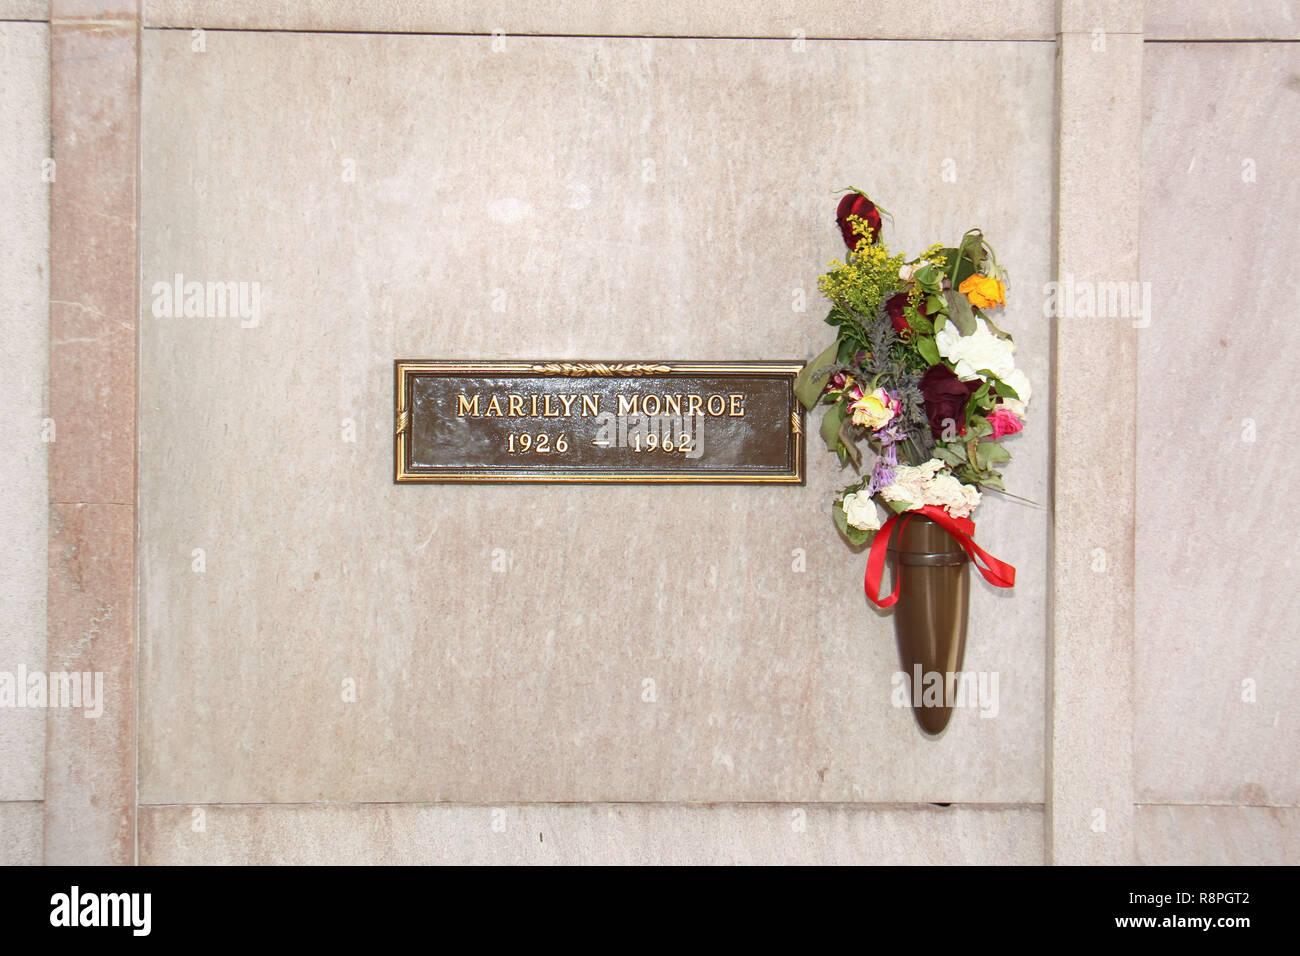 10/28/09 'Marilyn Monroe Lápida' @ West Village Memorial